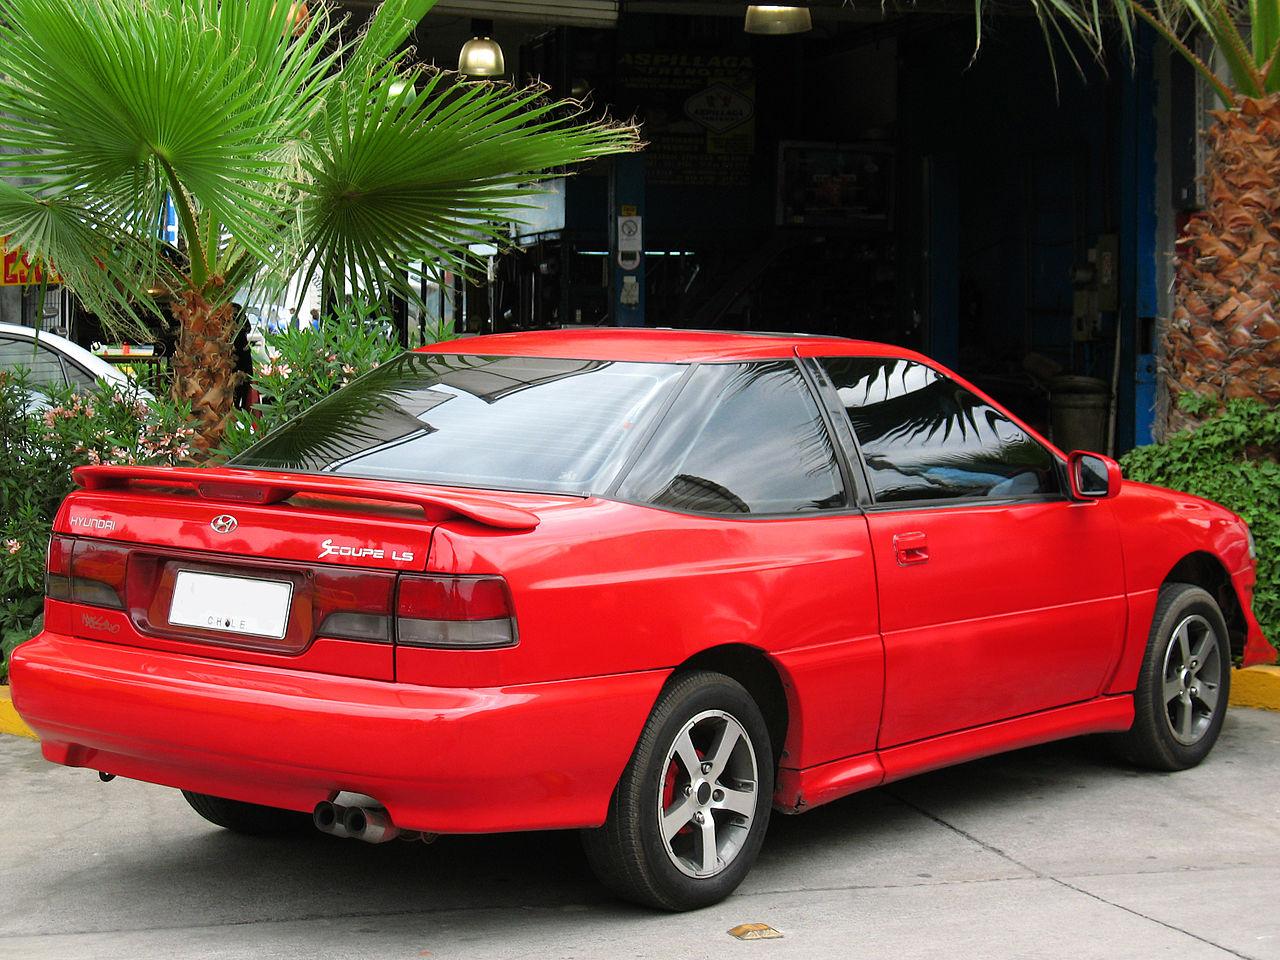 File Hyundai Scoupe 1 5 Ls 1993 14984835172 Jpg